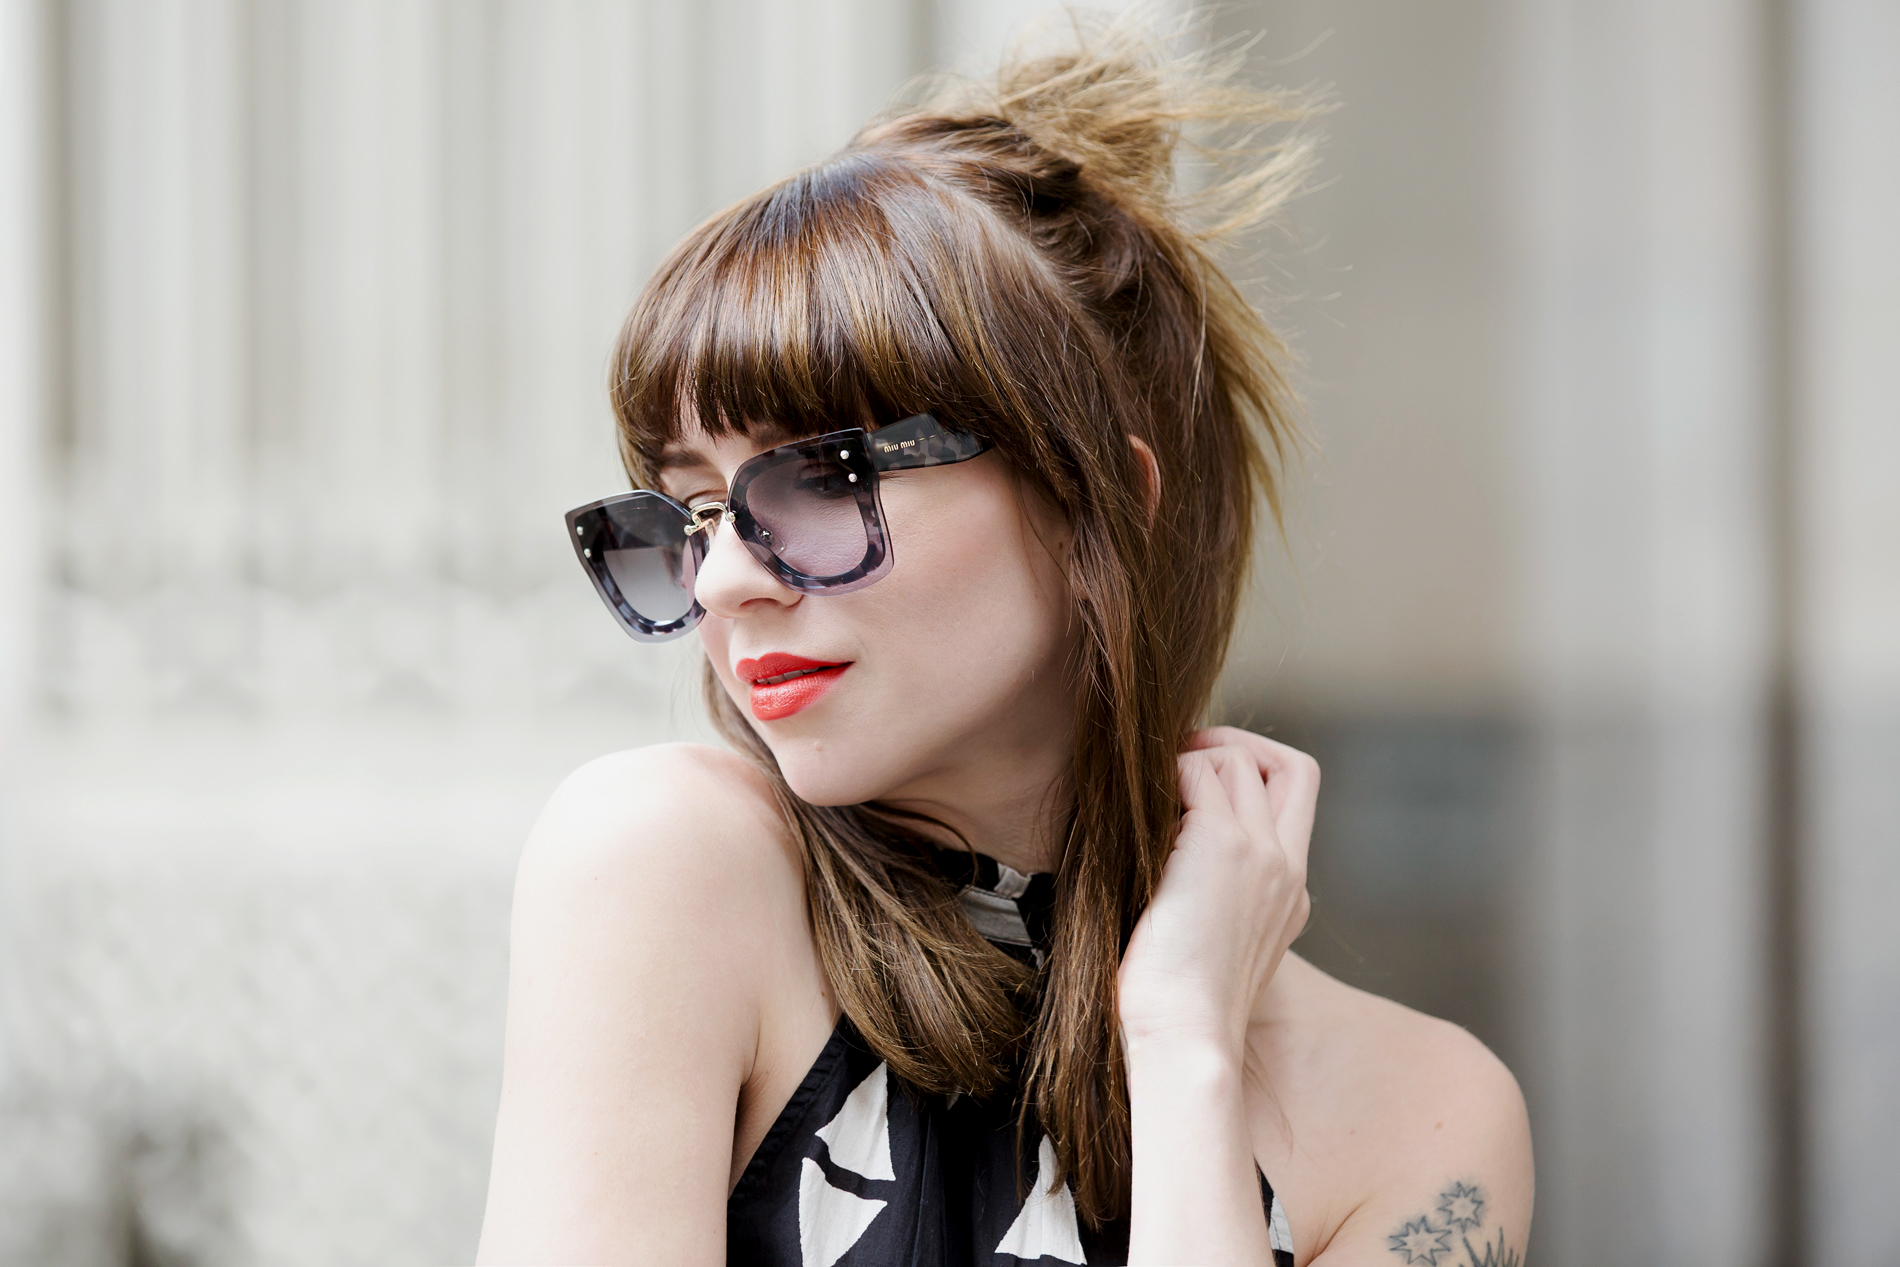 h&m maxi dress miu miu sunglasses chanel 2.55 double flap bag sacha heels ootd outfit styling fashionblogger modeblogger germany ricarda schernus cats & dogs styleblog 2